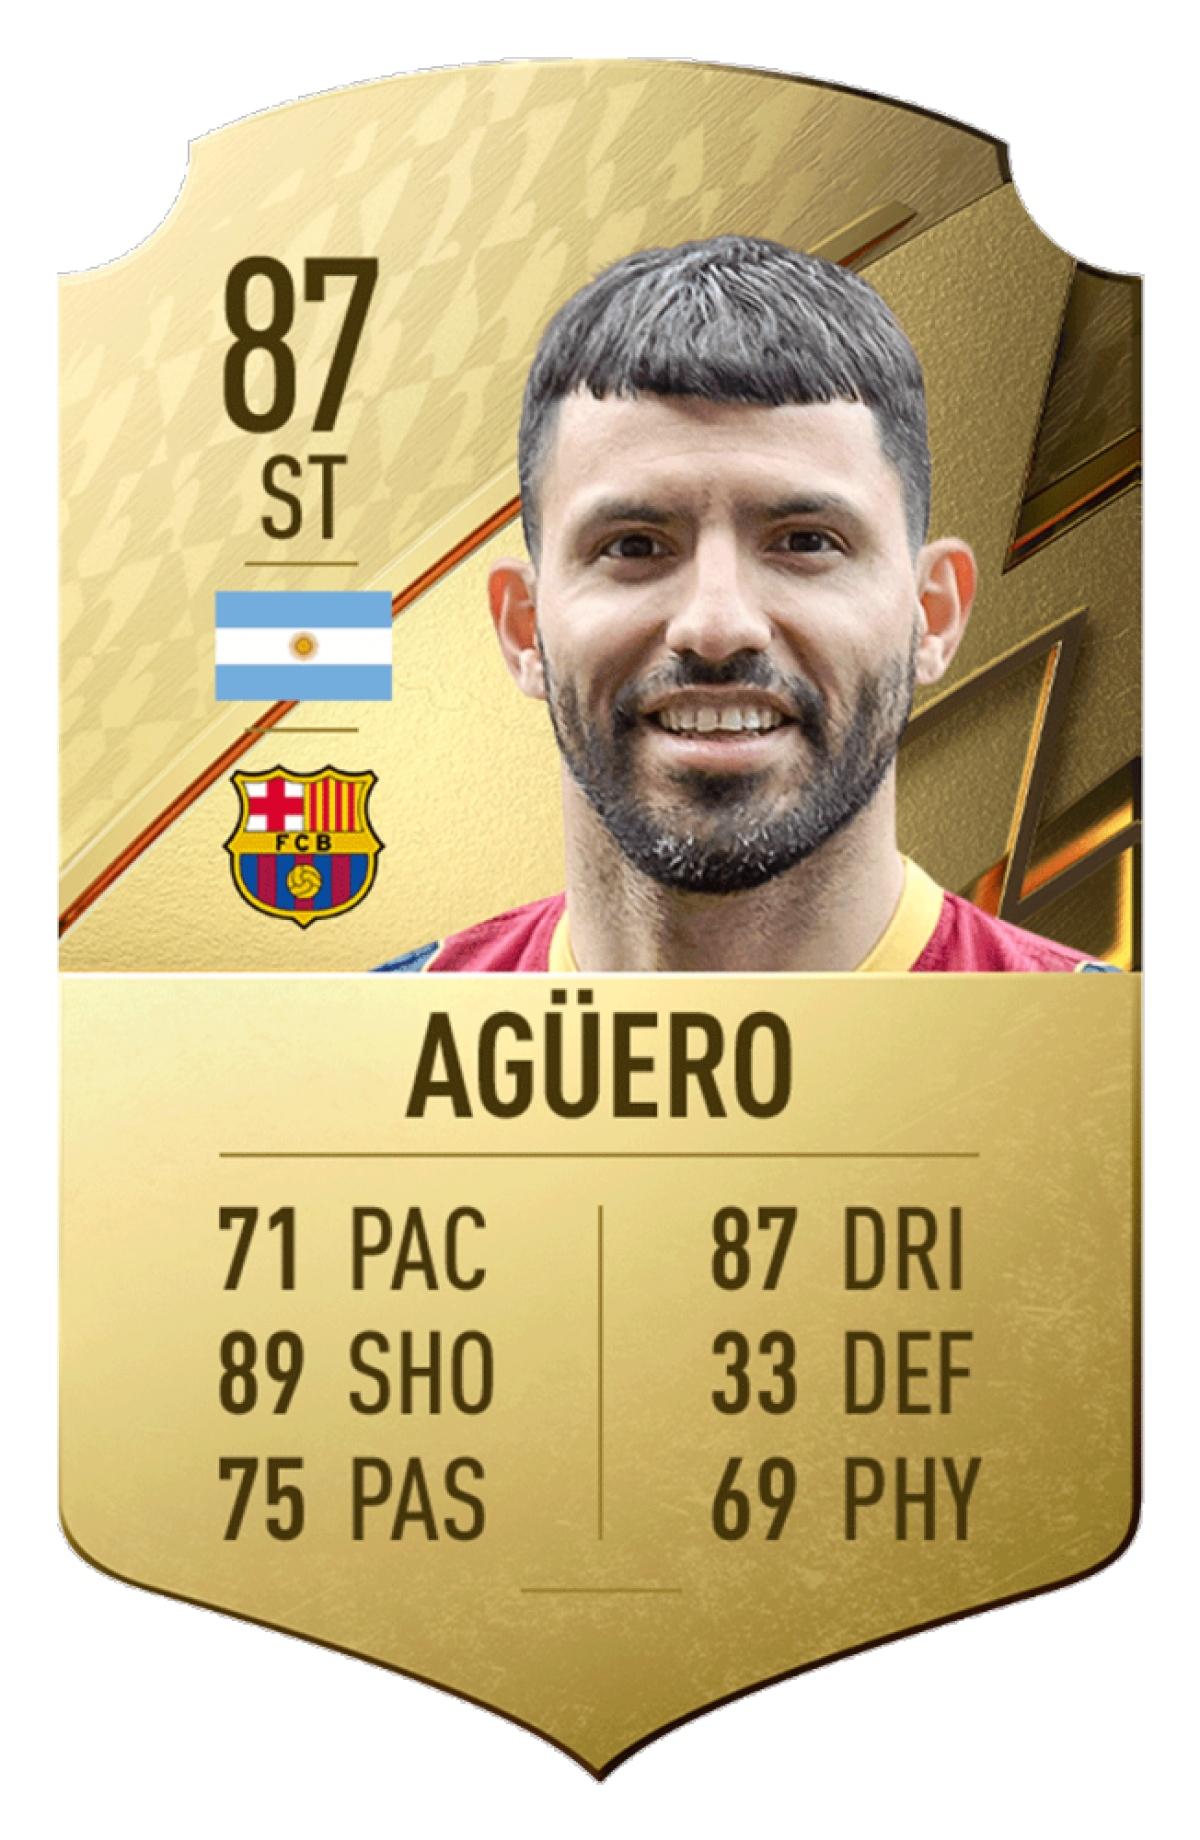 10. Sergio Aguero | Barca | Chỉ số tổng quan: 87